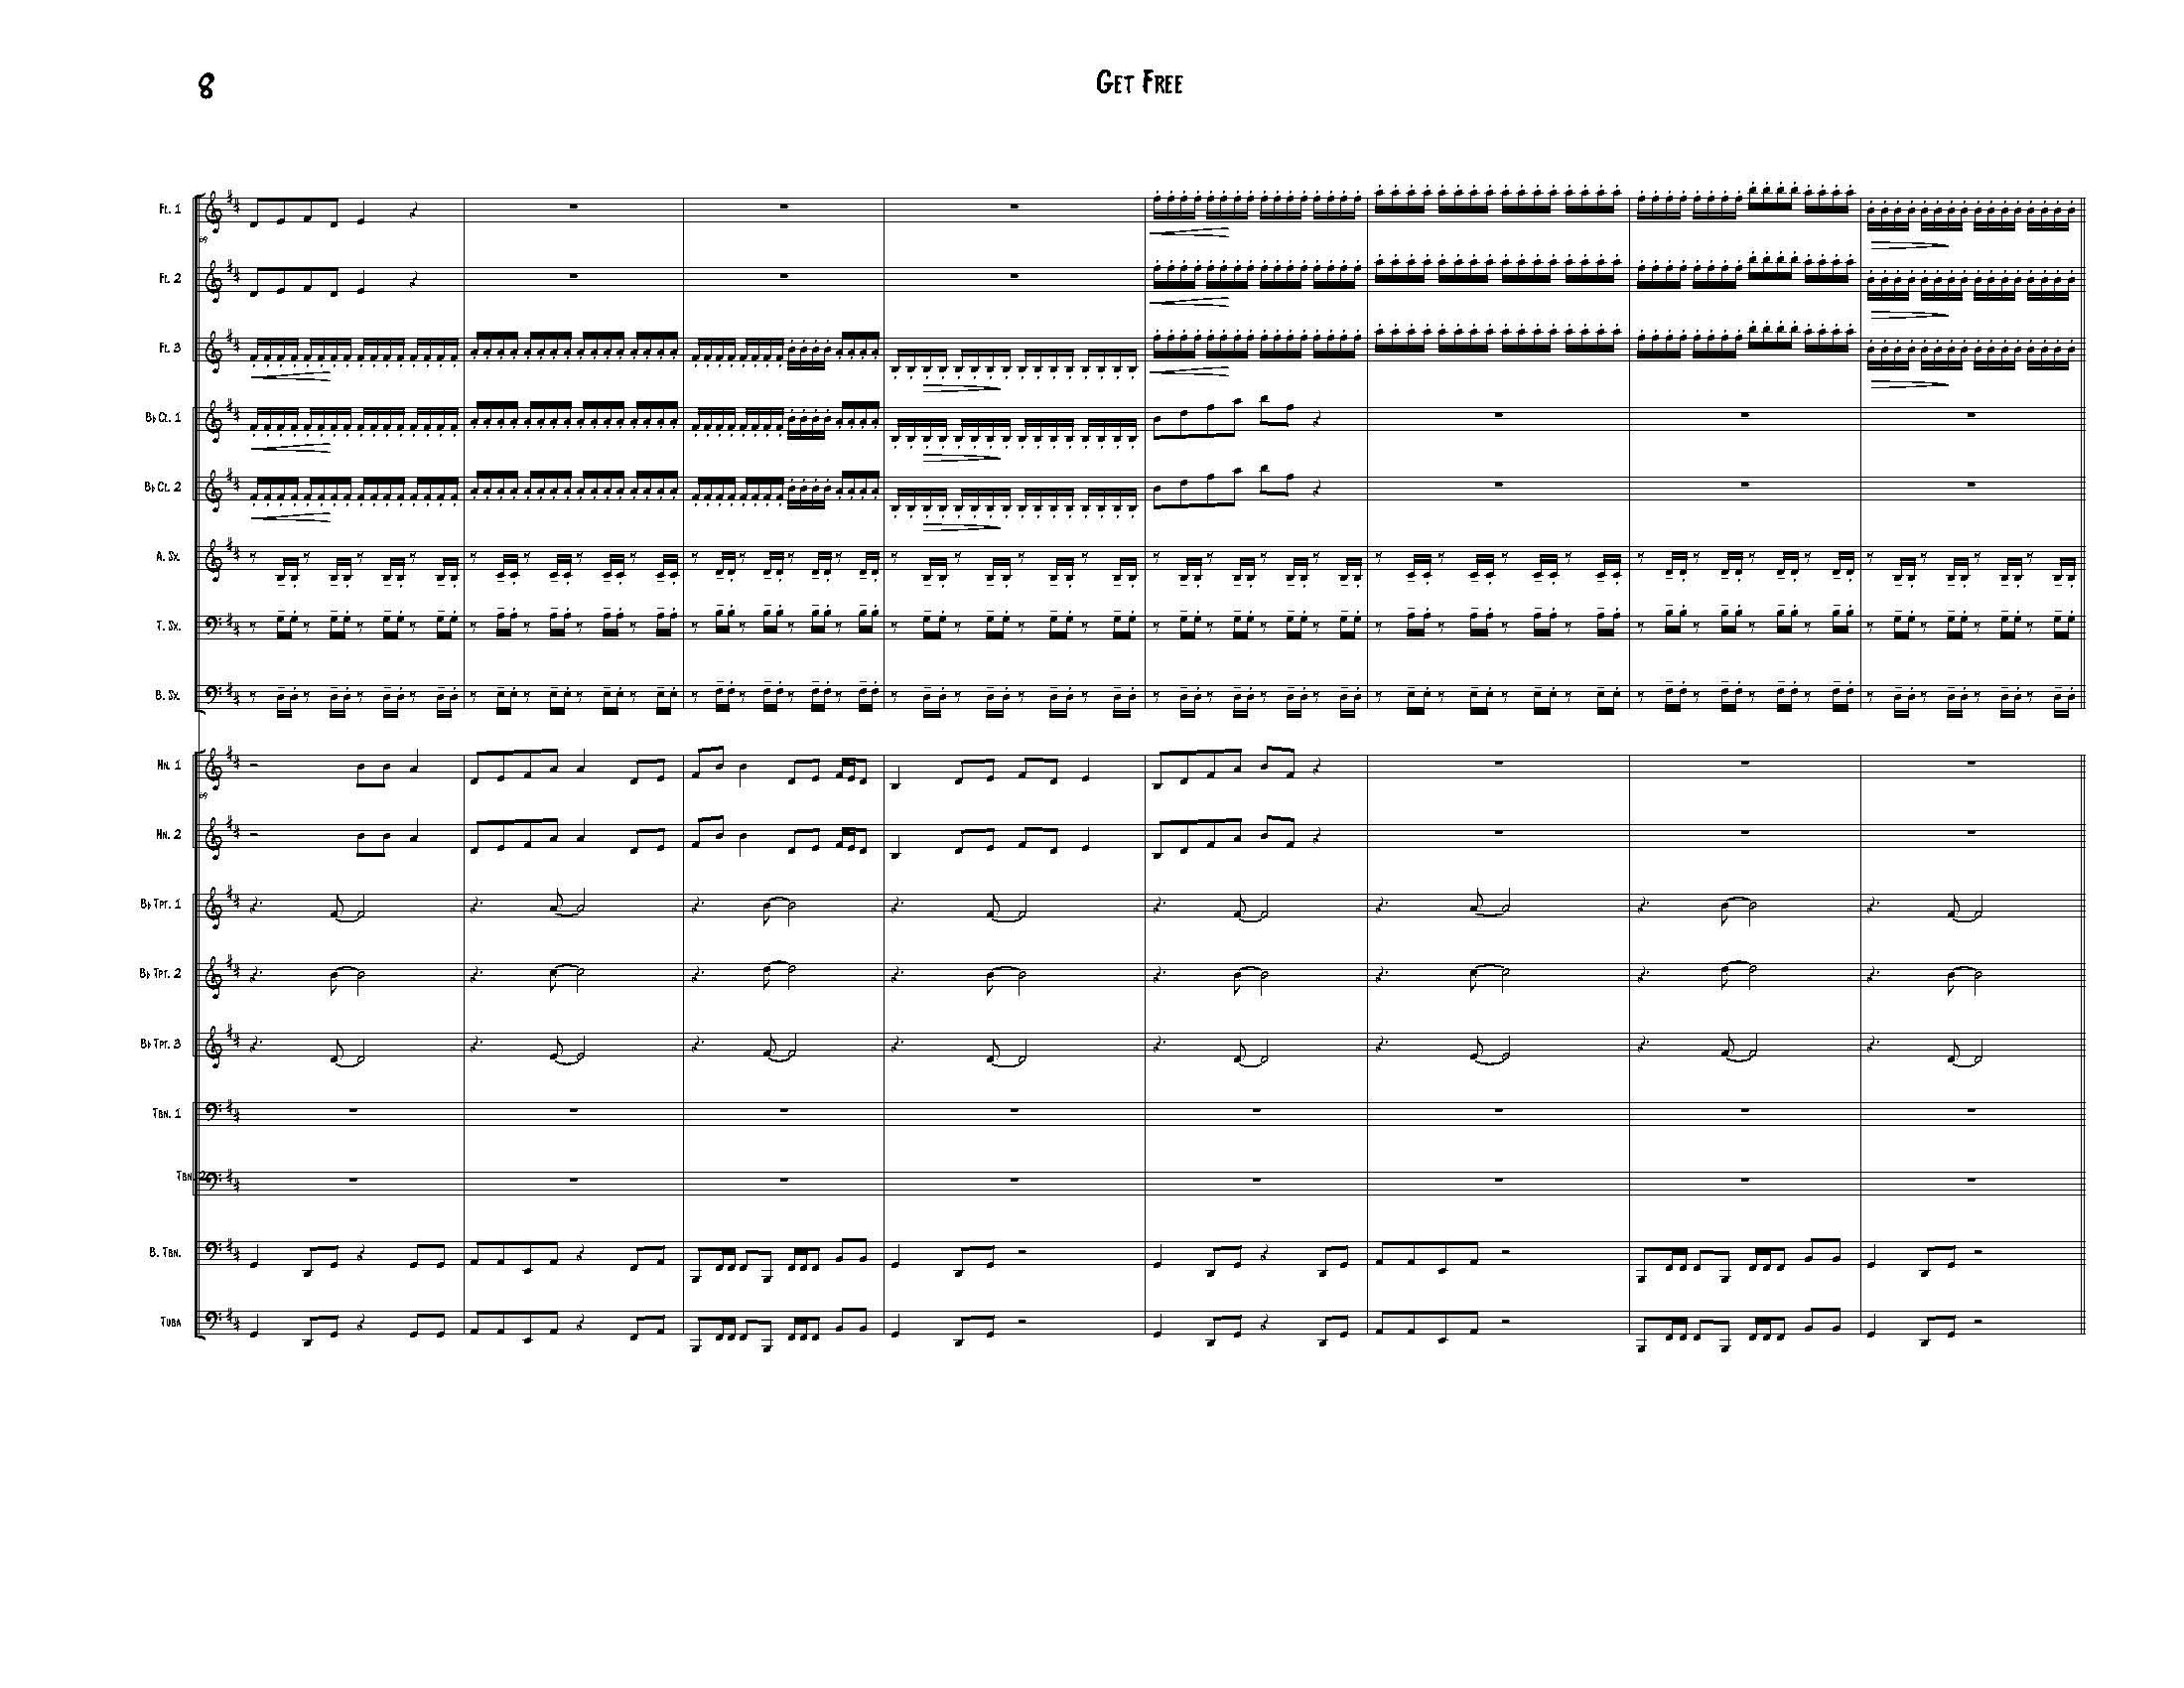 Get Free BKLYN 1834 Score_Page_08.jpg